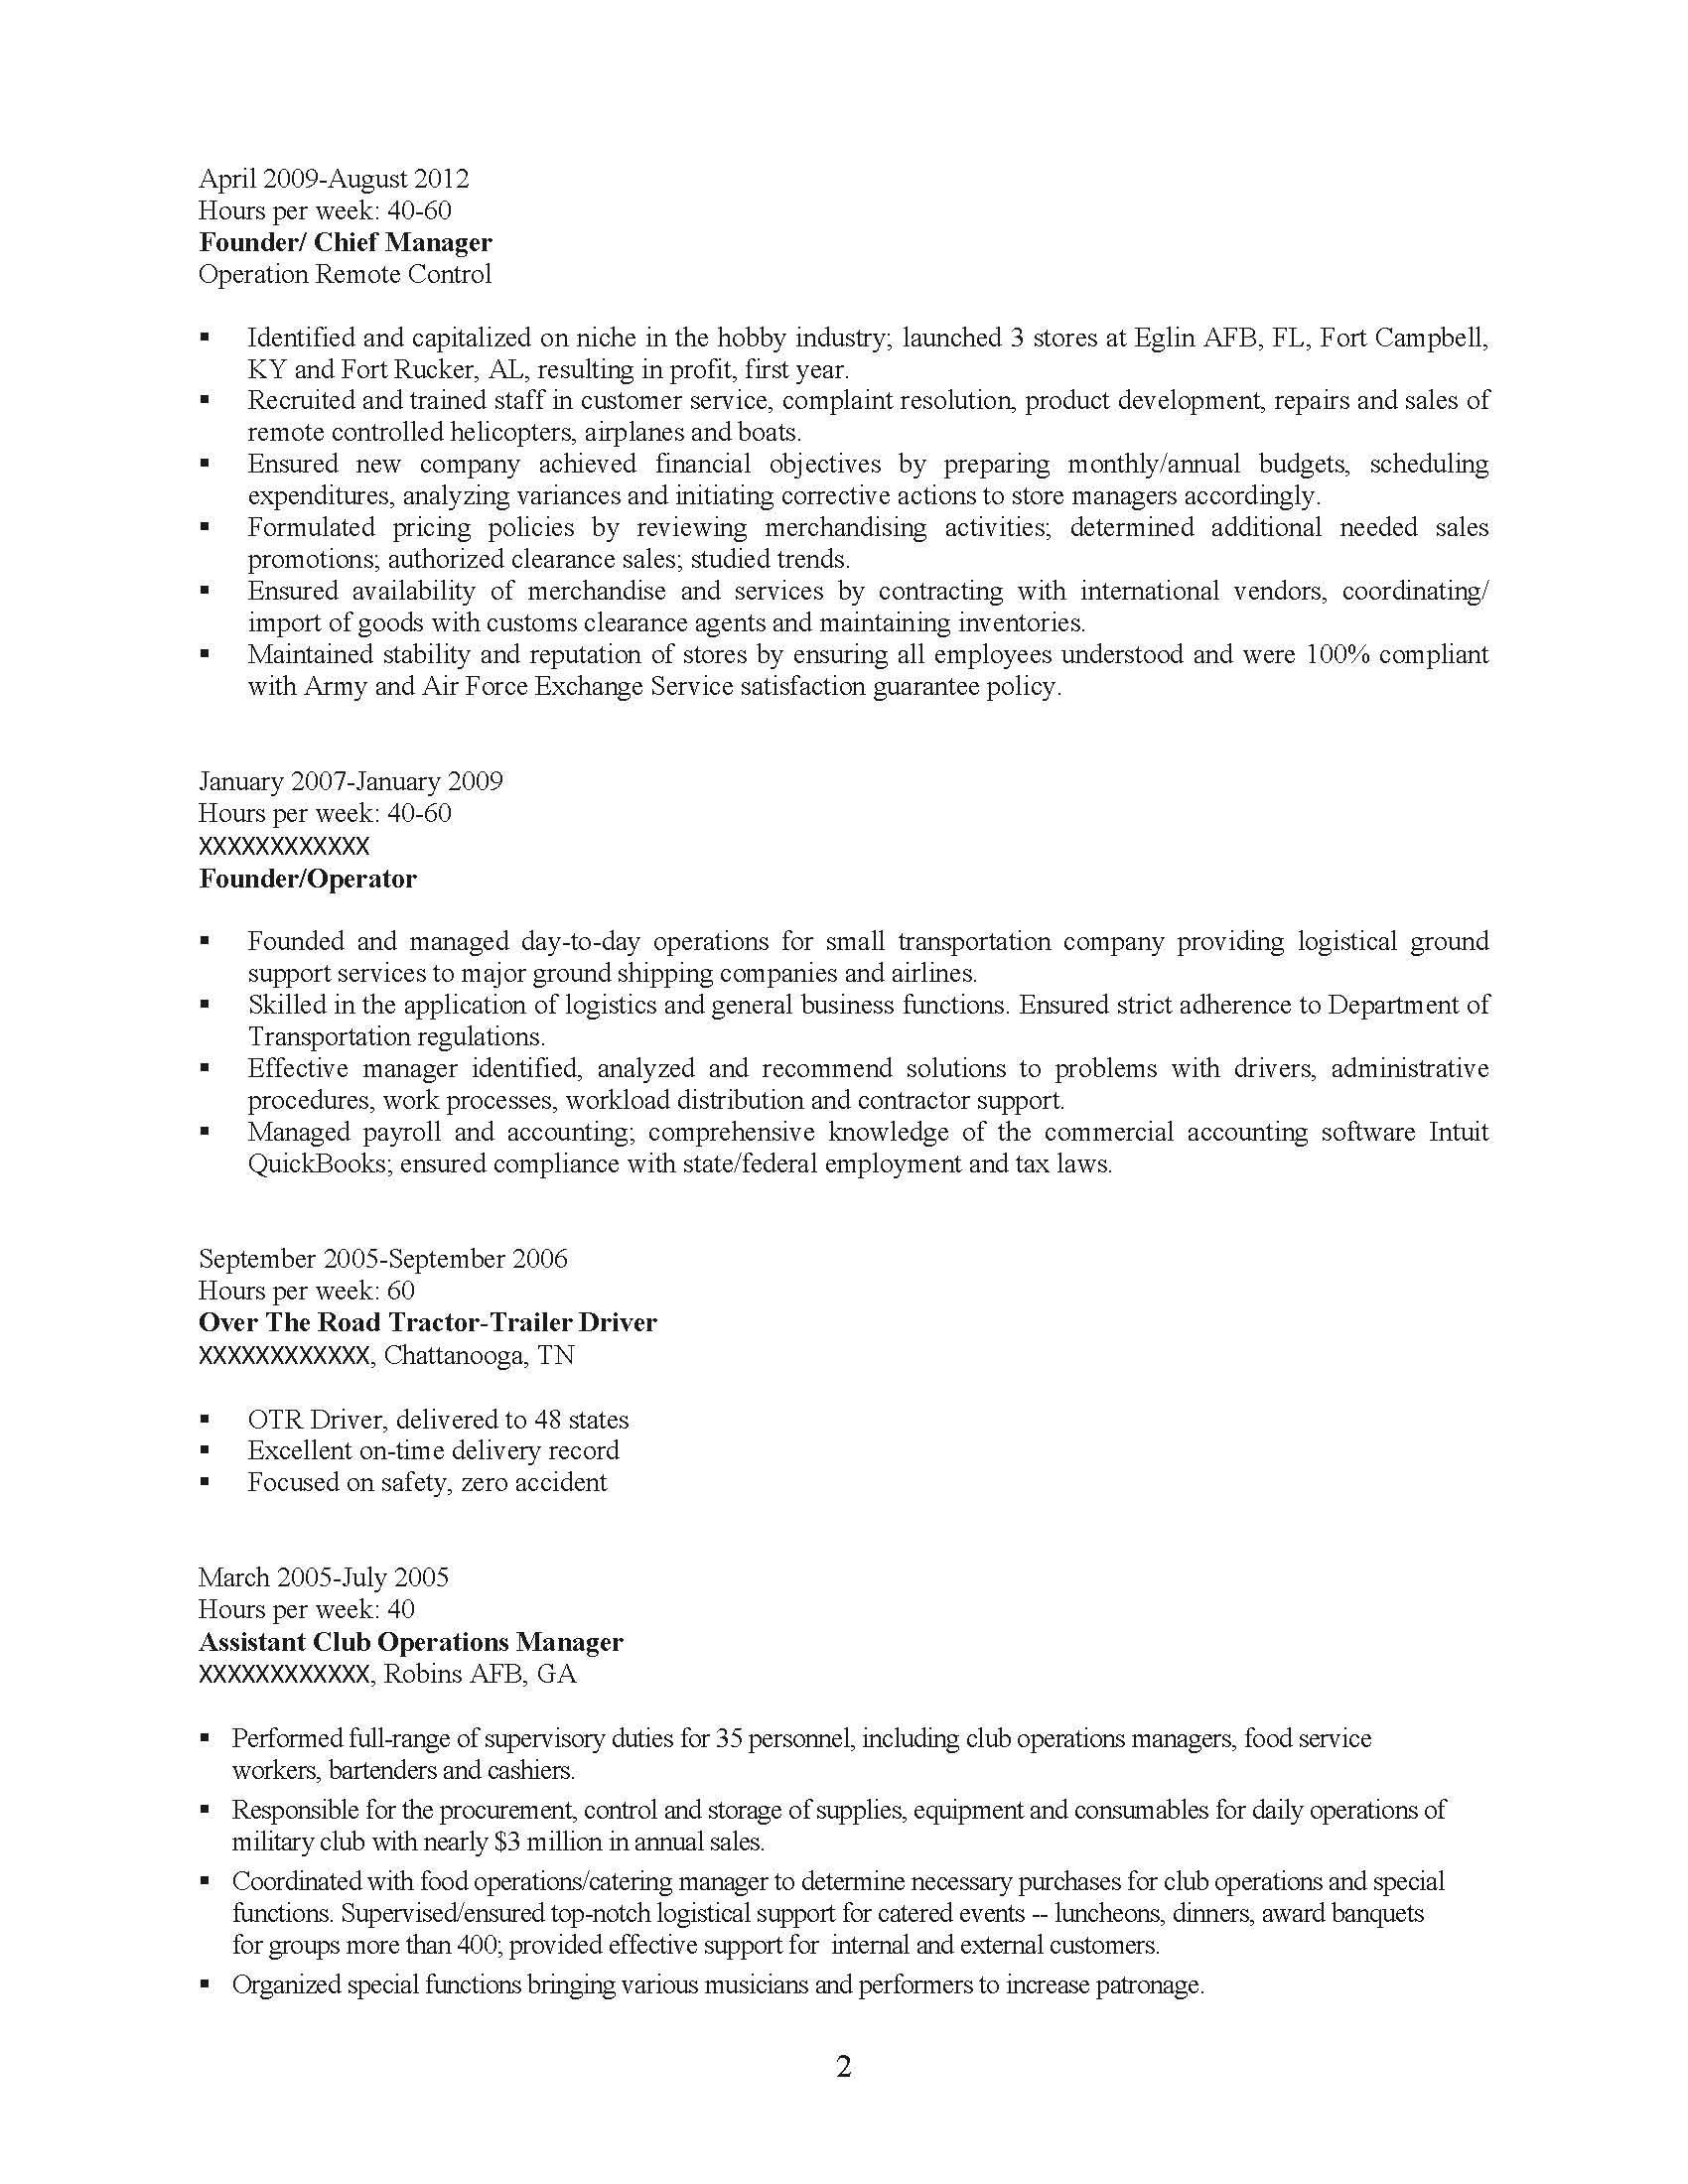 Senior Management Professional Resume Sample - Before-2